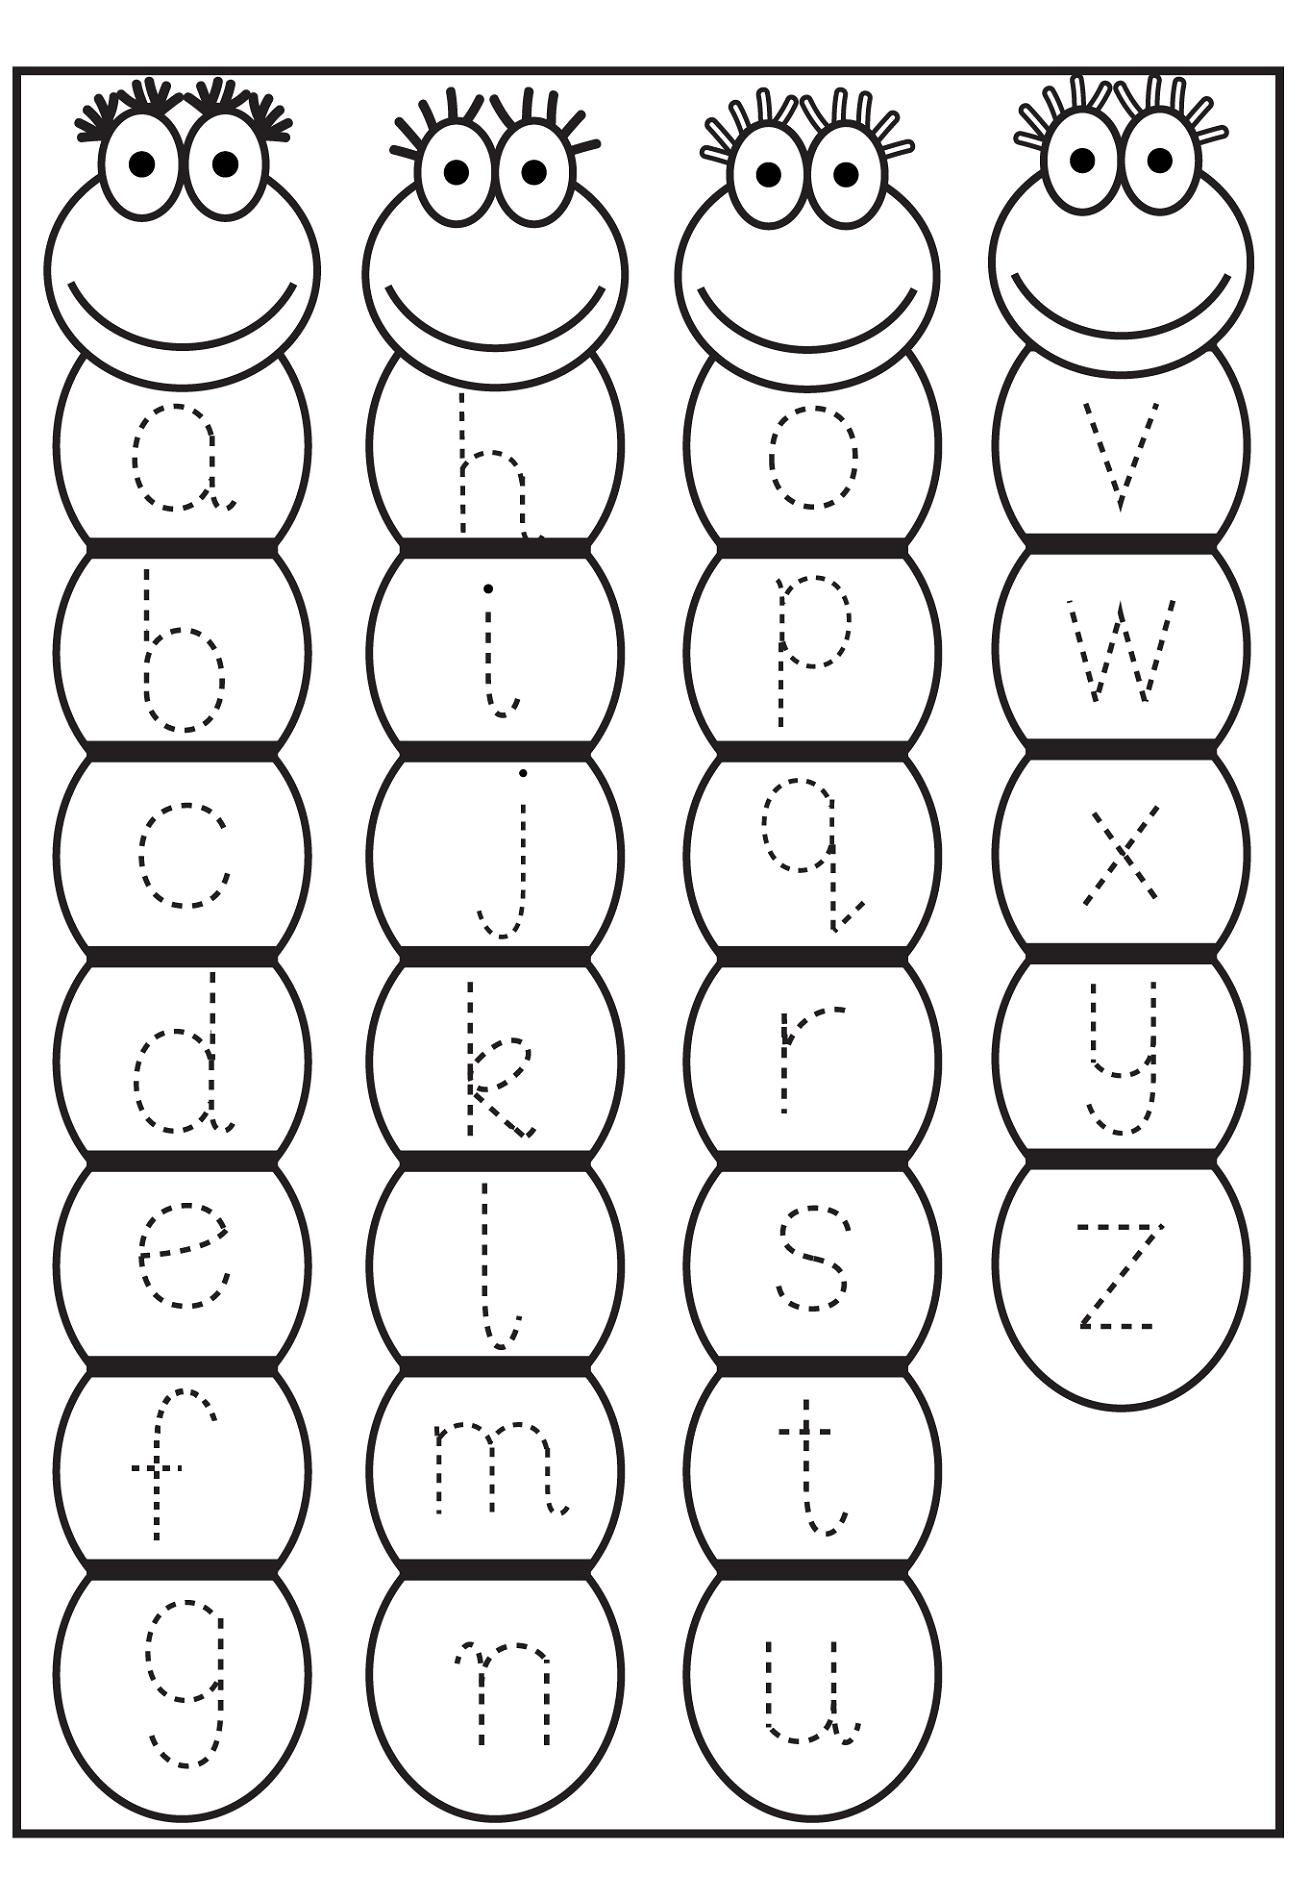 traceable letter a worksheet